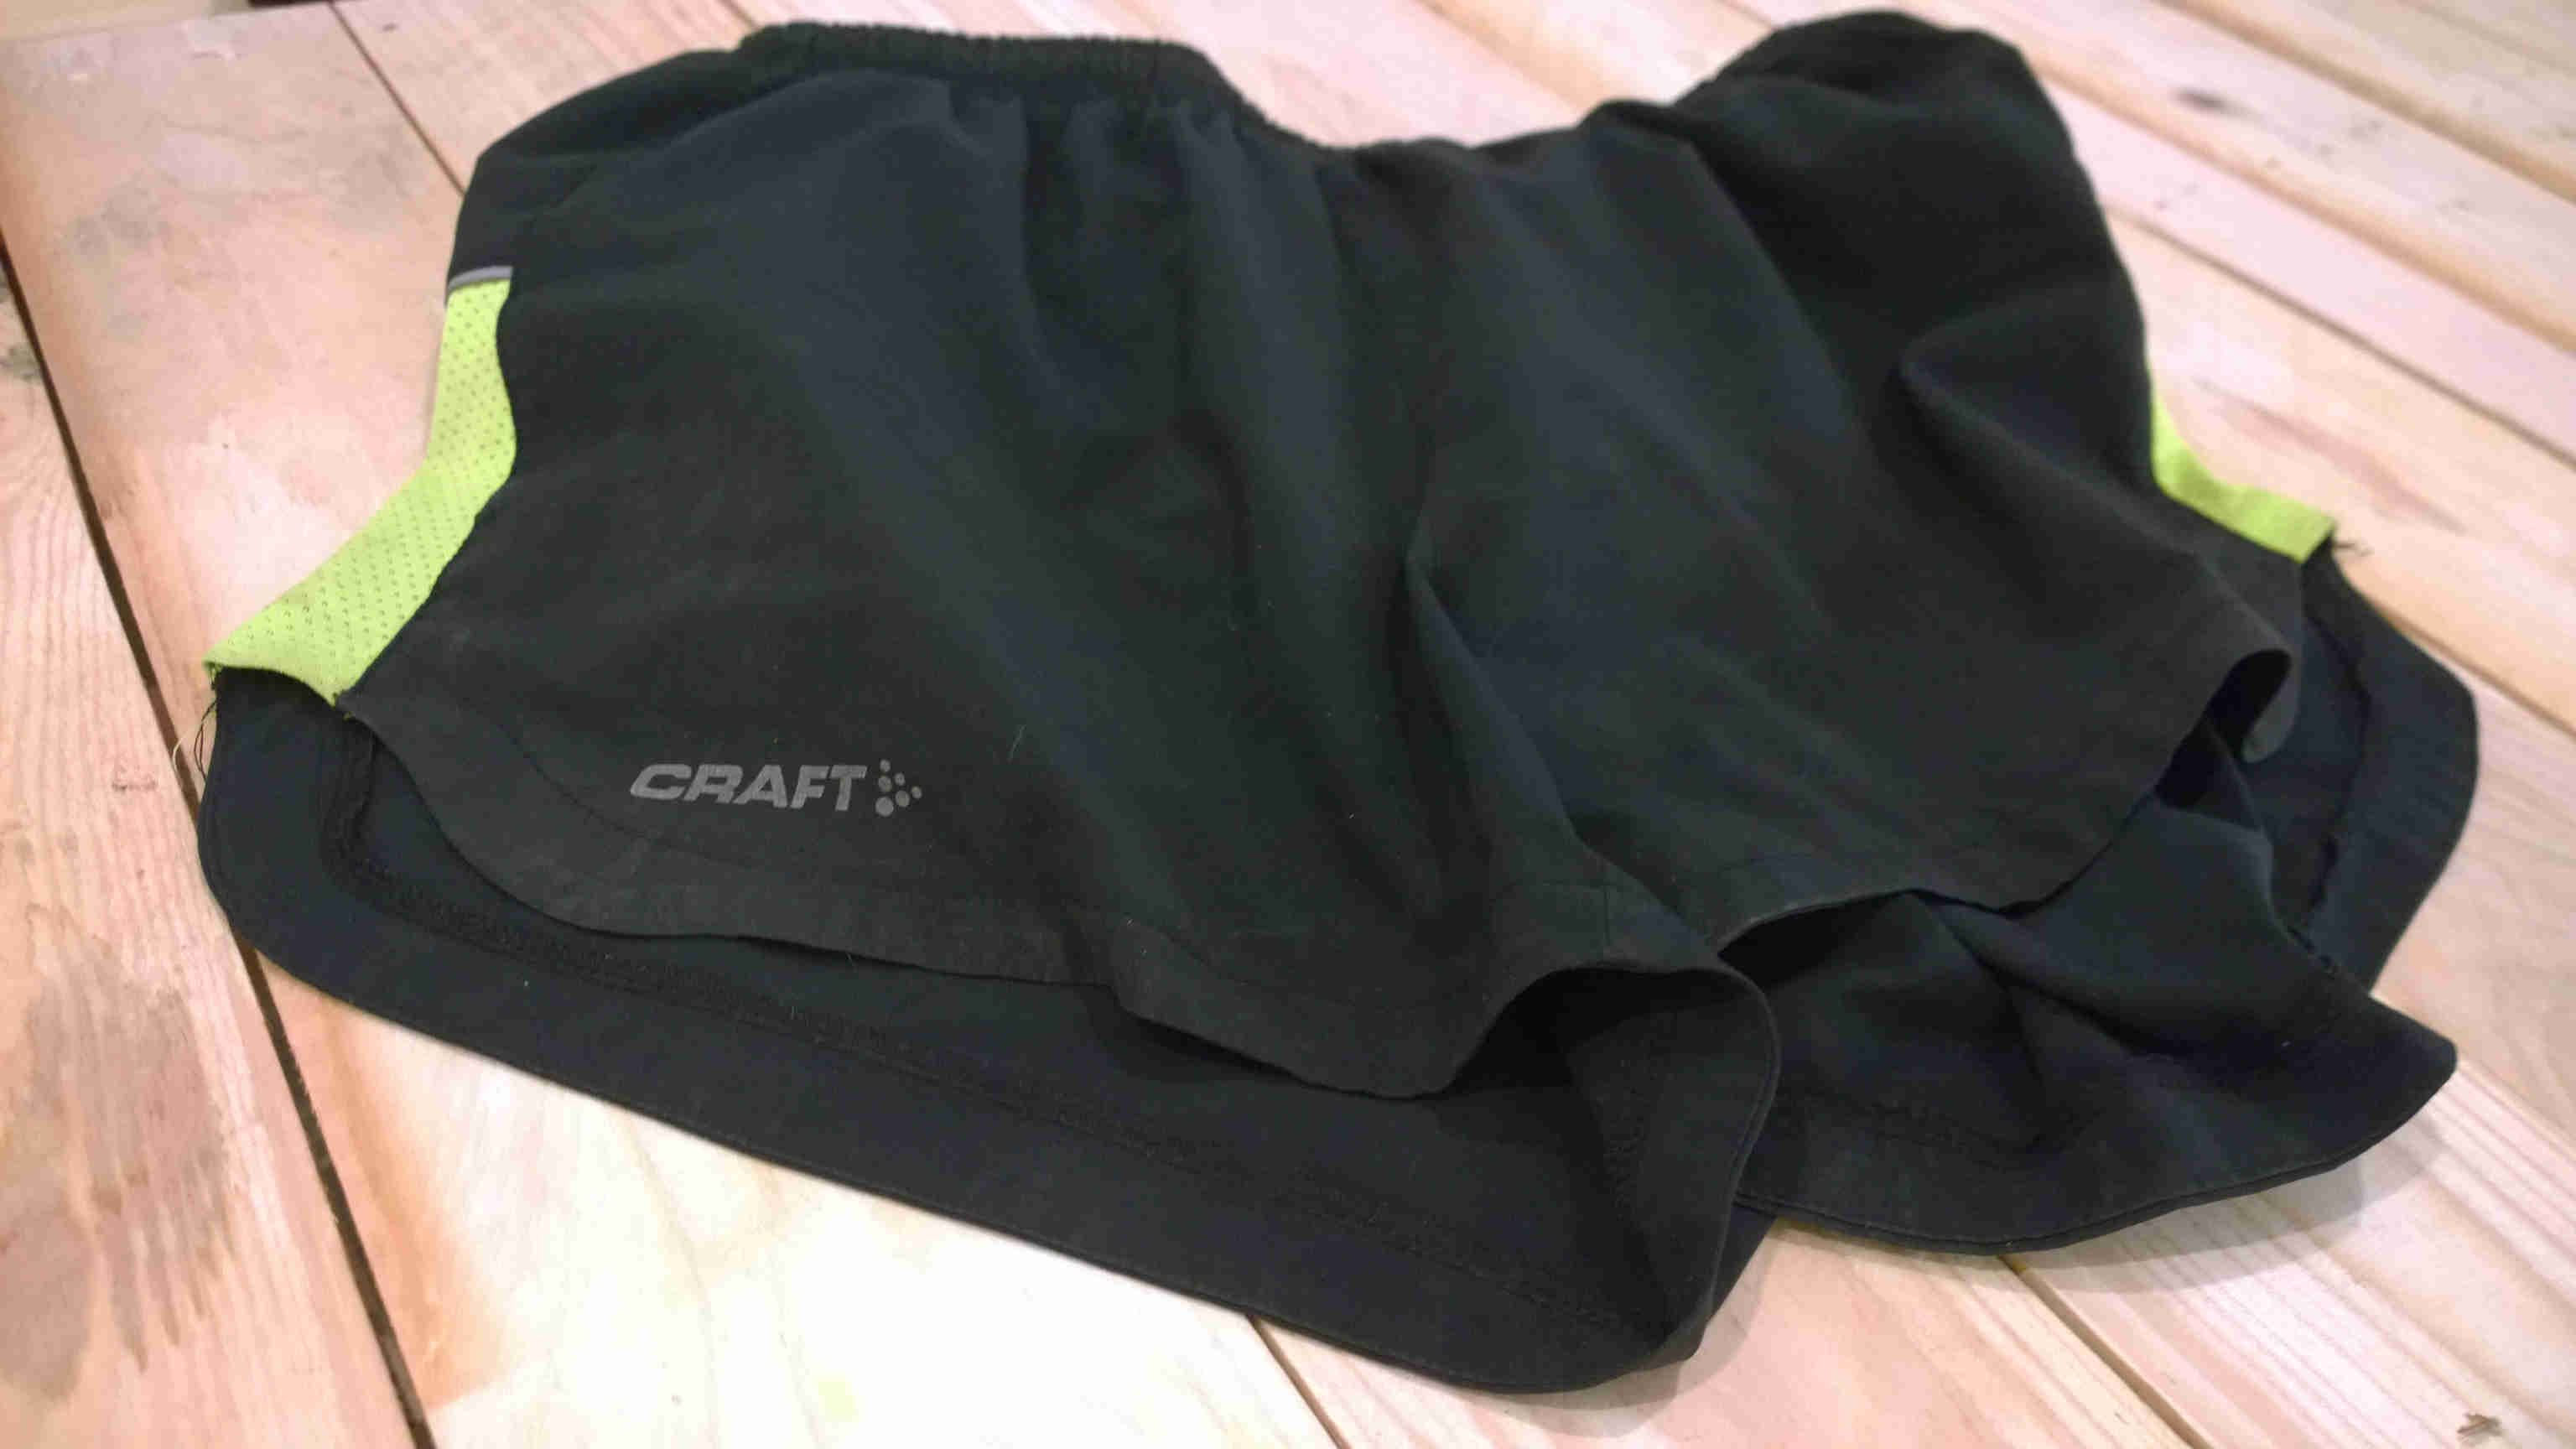 Bežecké kraťasy Craft, recenzia